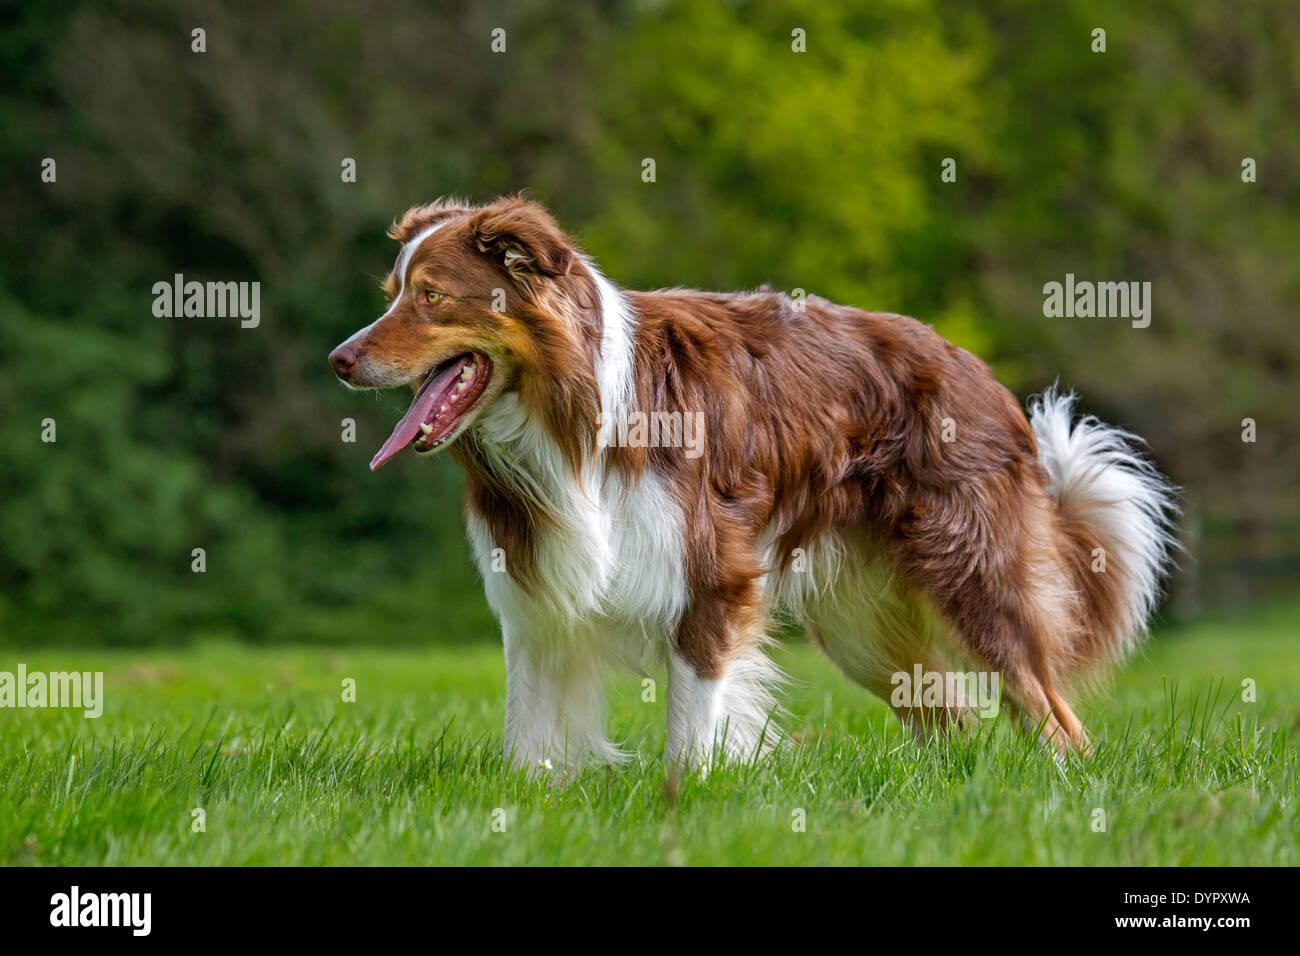 Border collie (Canis lupus familiaris) panting in garden - Stock Image